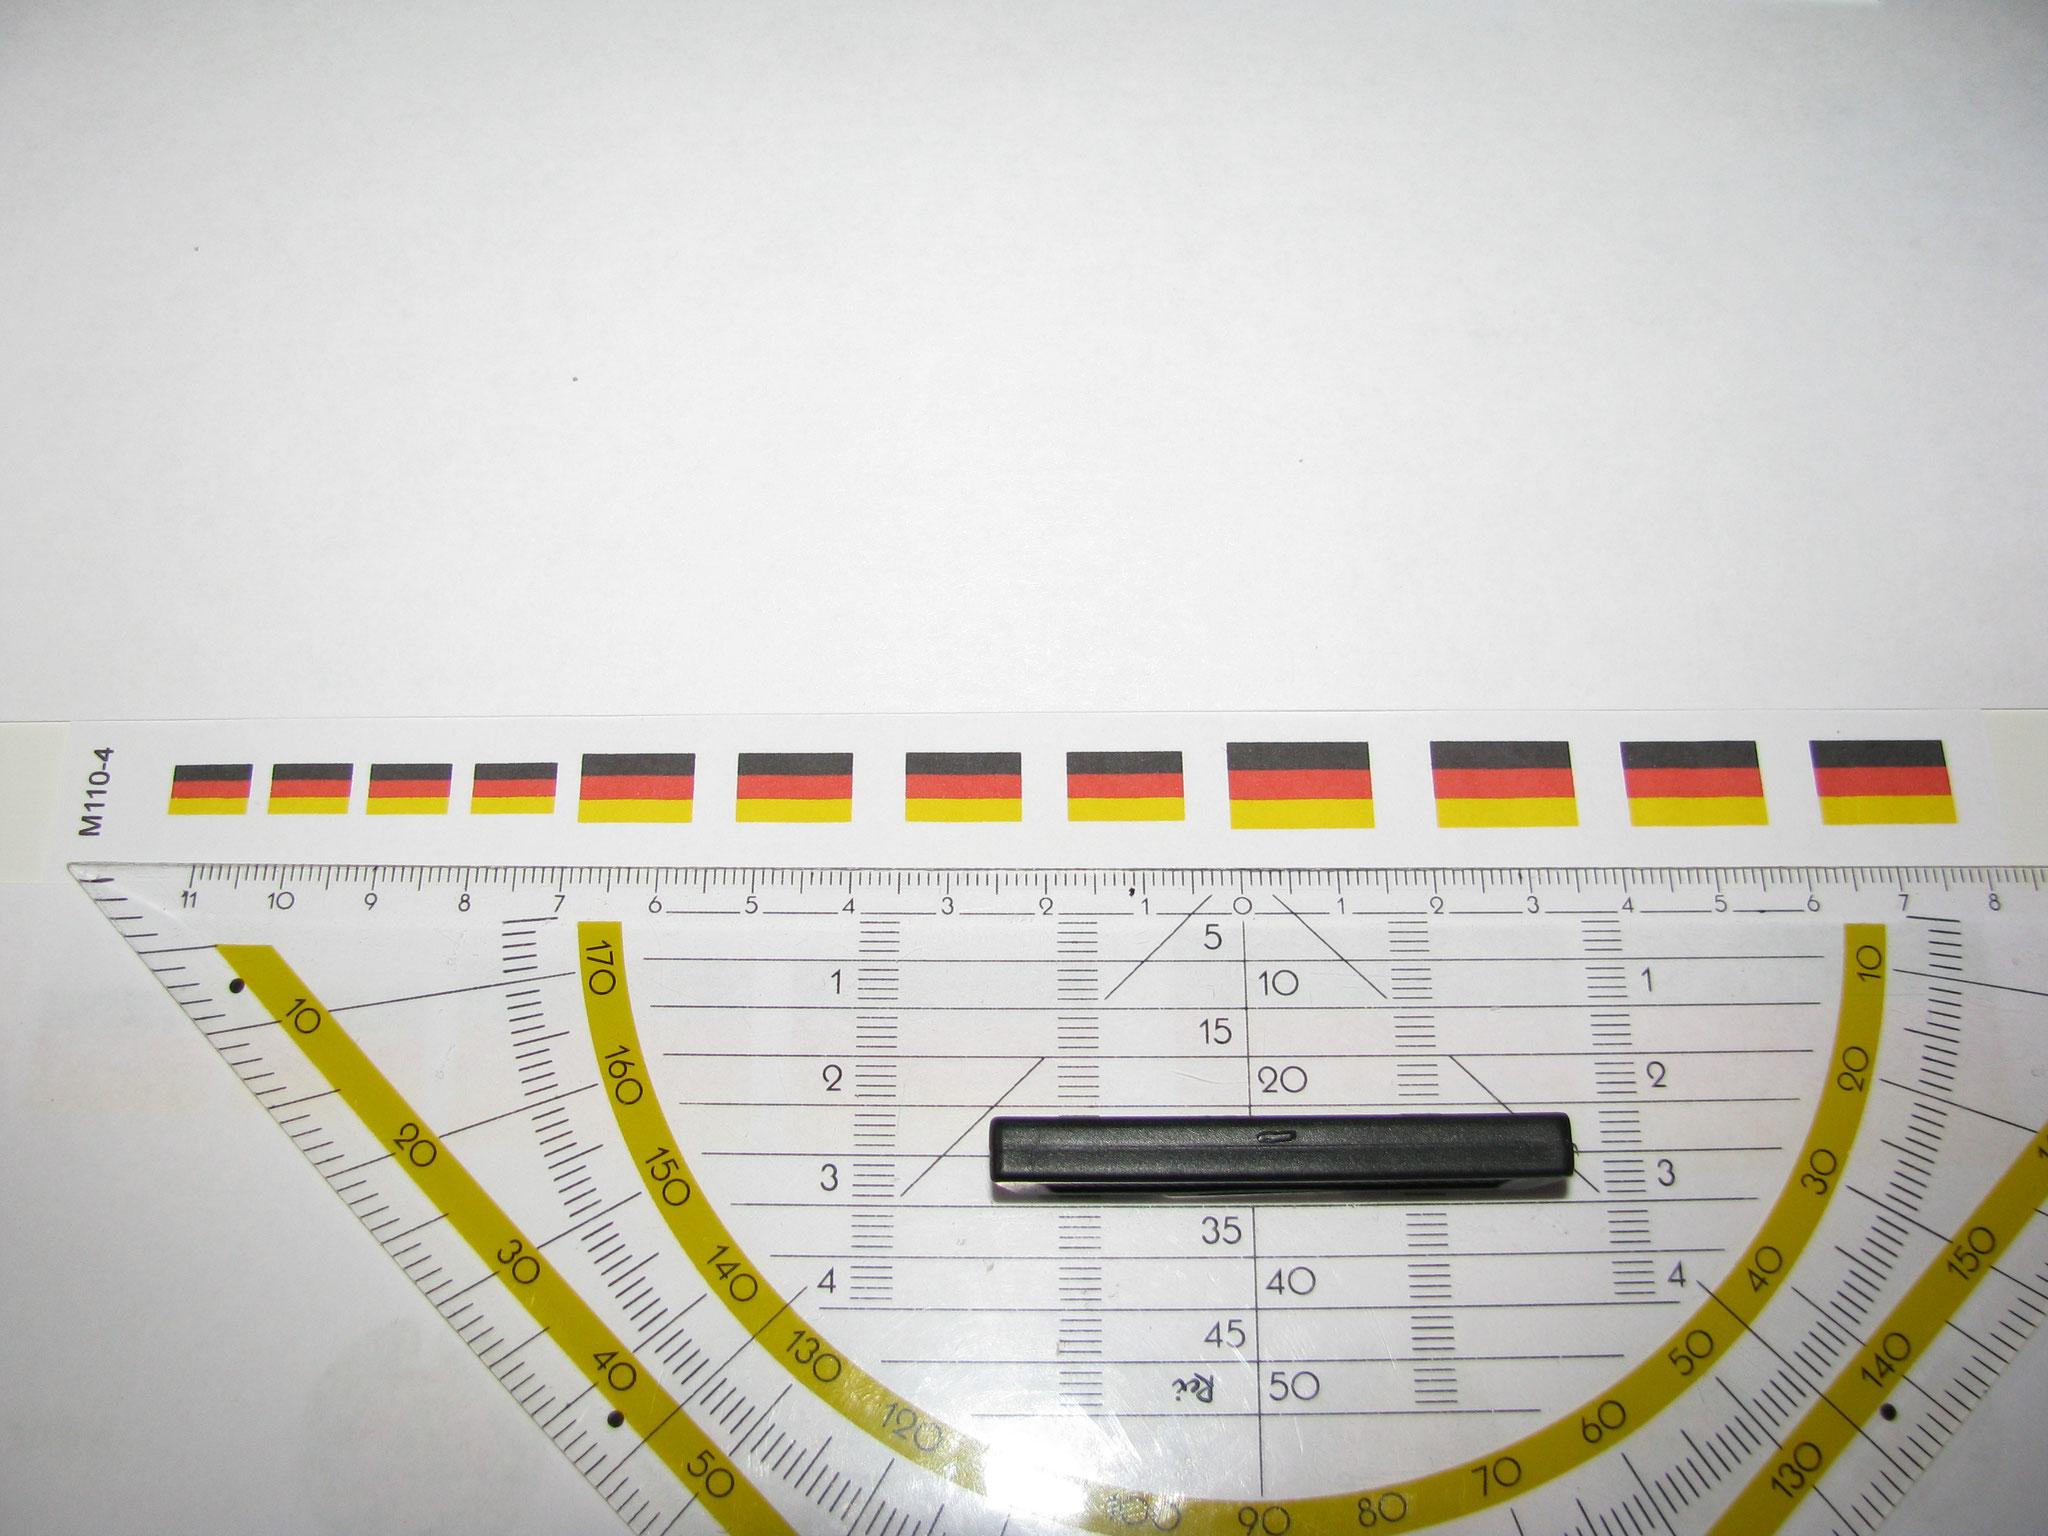 M110-4: BRD Flagge. 6 Decals. Max 15x10mm